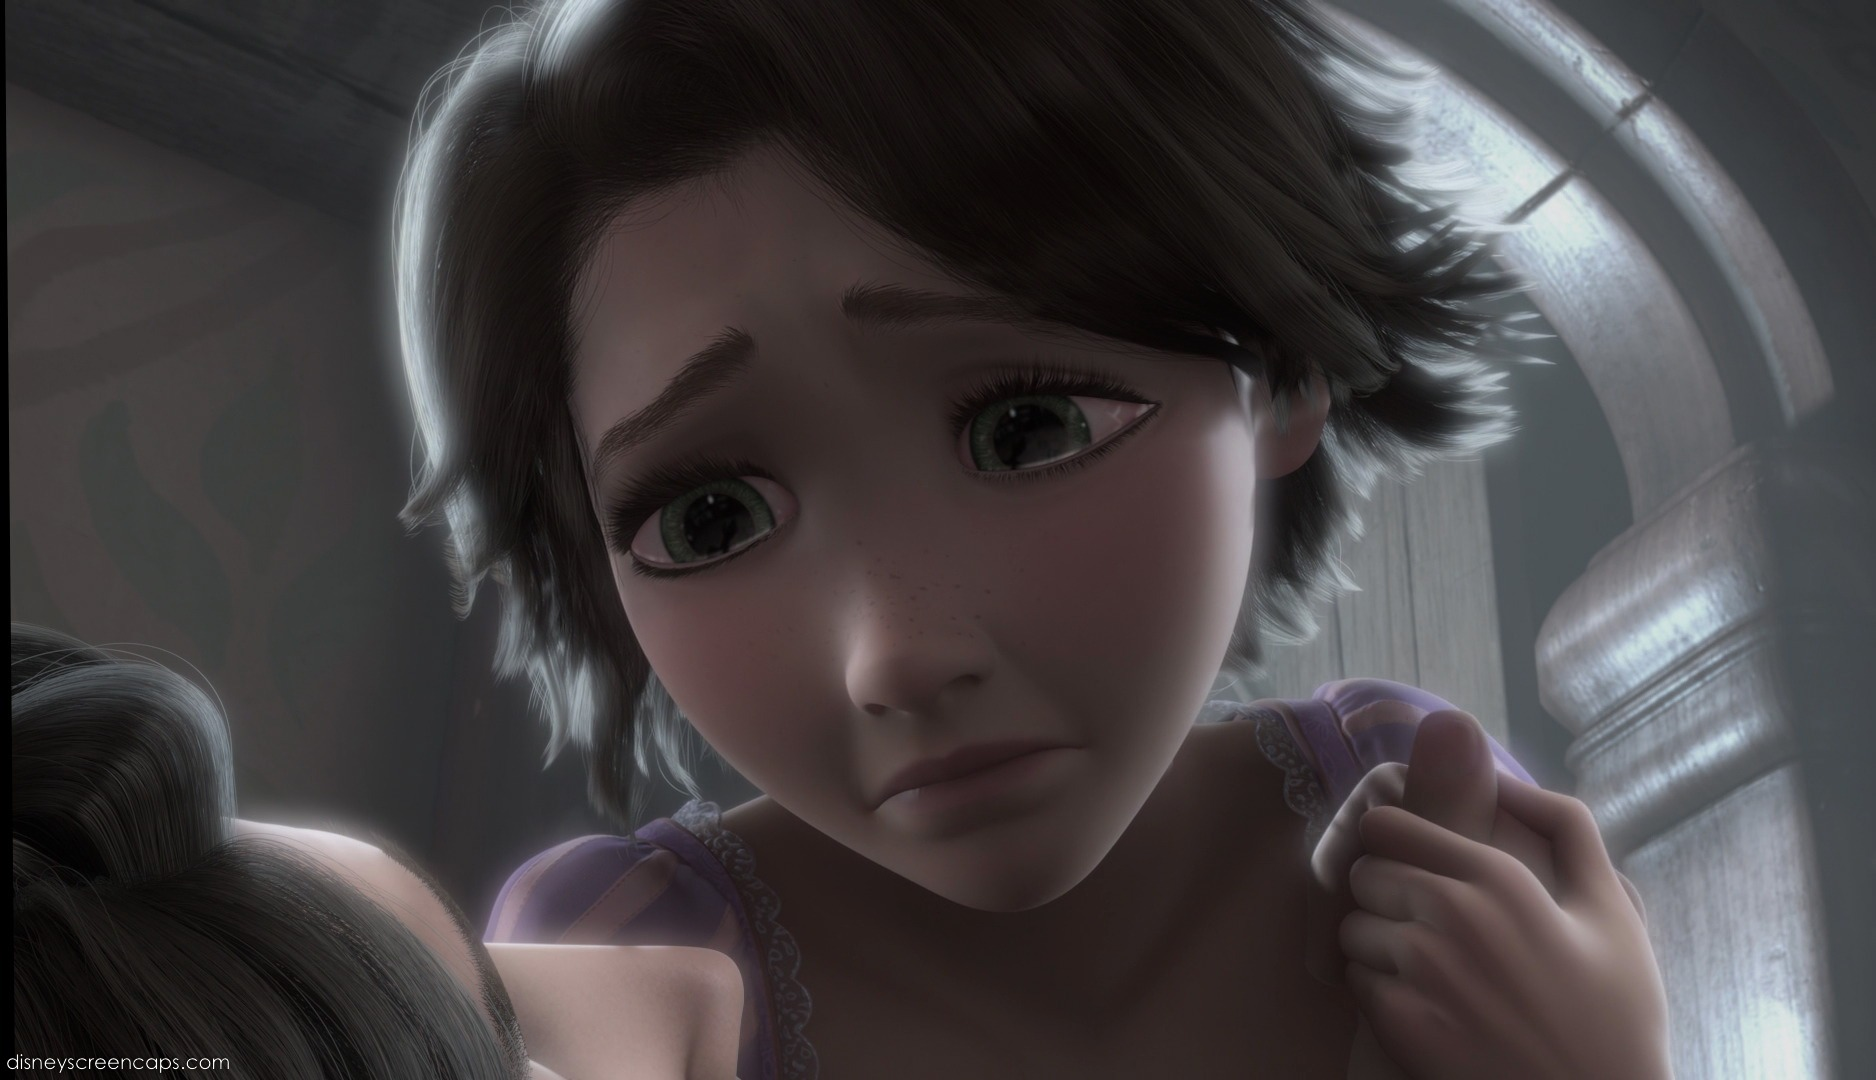 http://images.wikia.com/disney/images/c/cf/Rapunzel_146.jpg